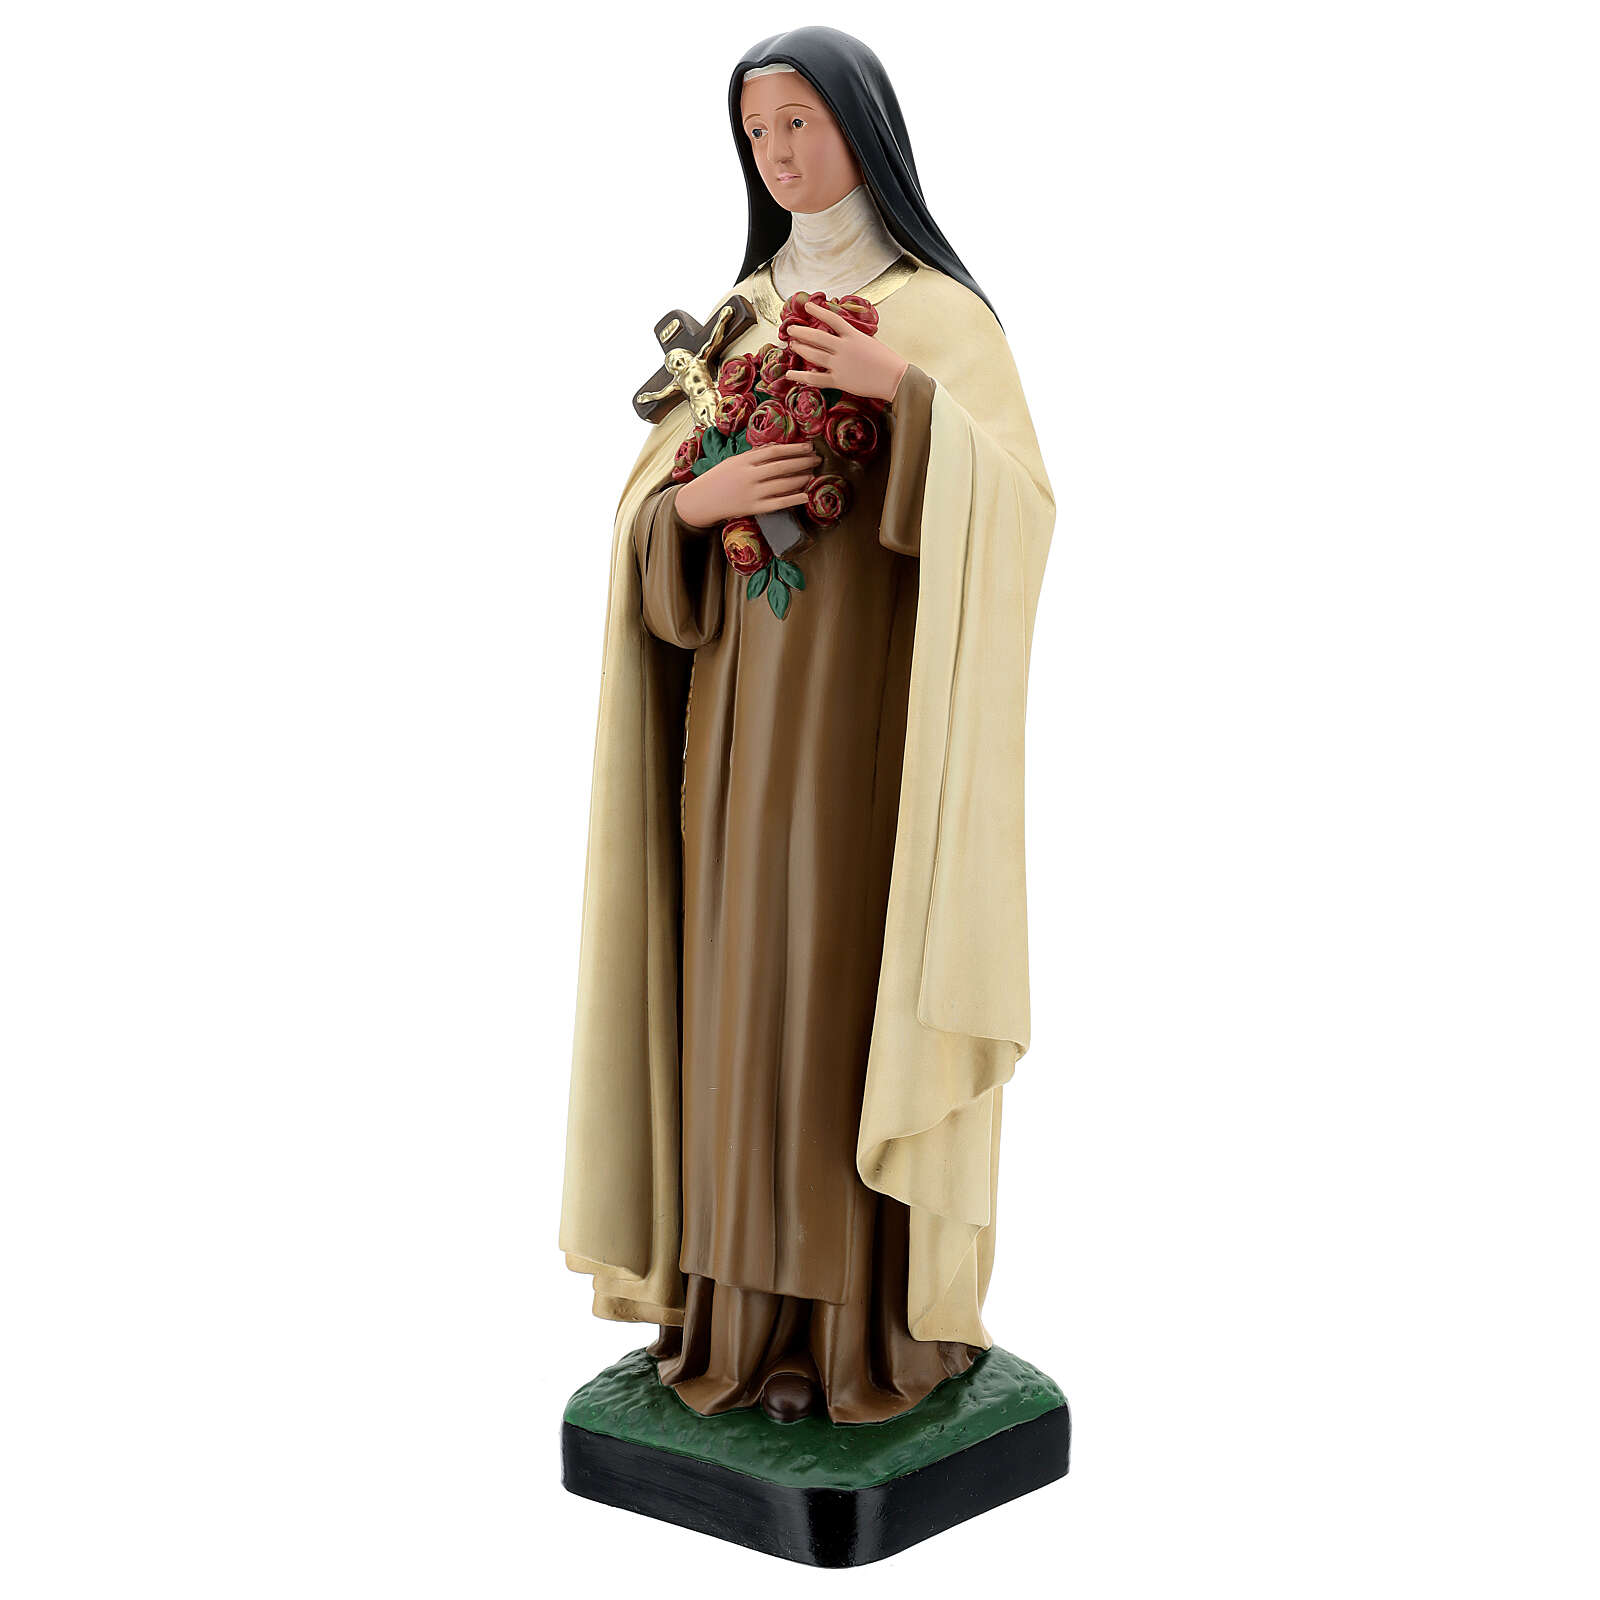 Statue St. Therese of Lisieux 60 cm resin Arte Barsanti 4